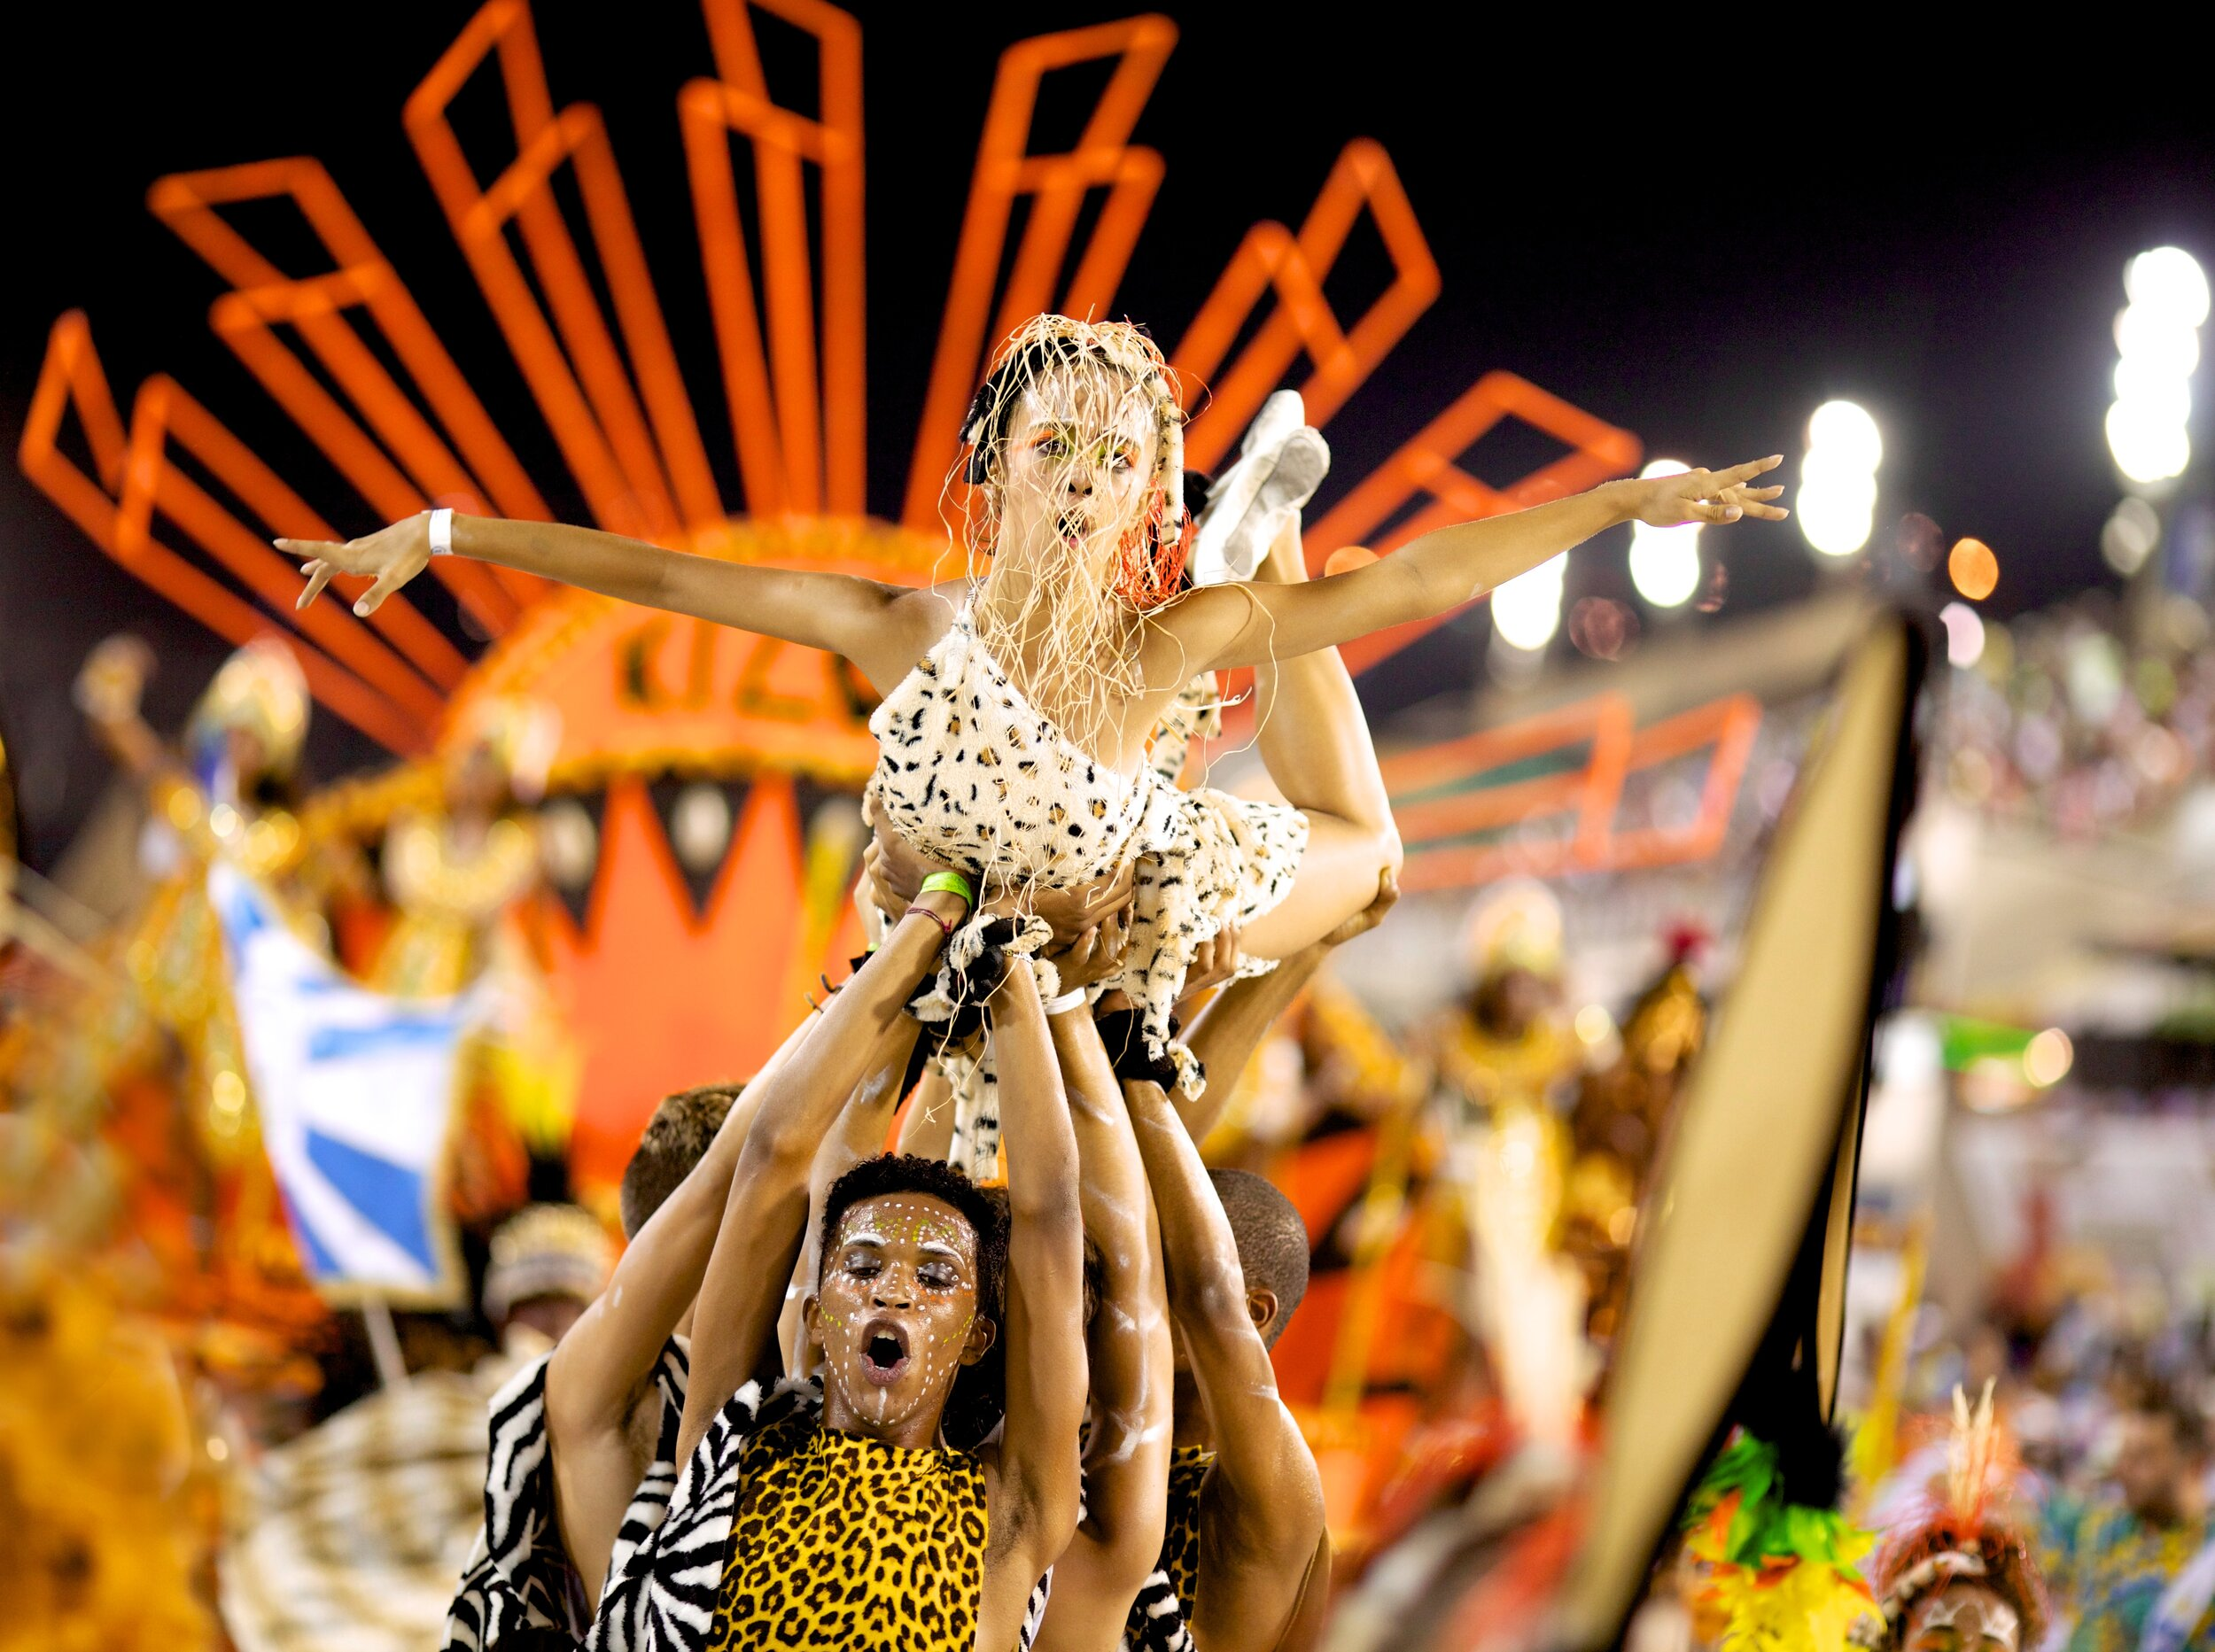 Rio Kids Carnaval 10 73 - Version 2.jpg